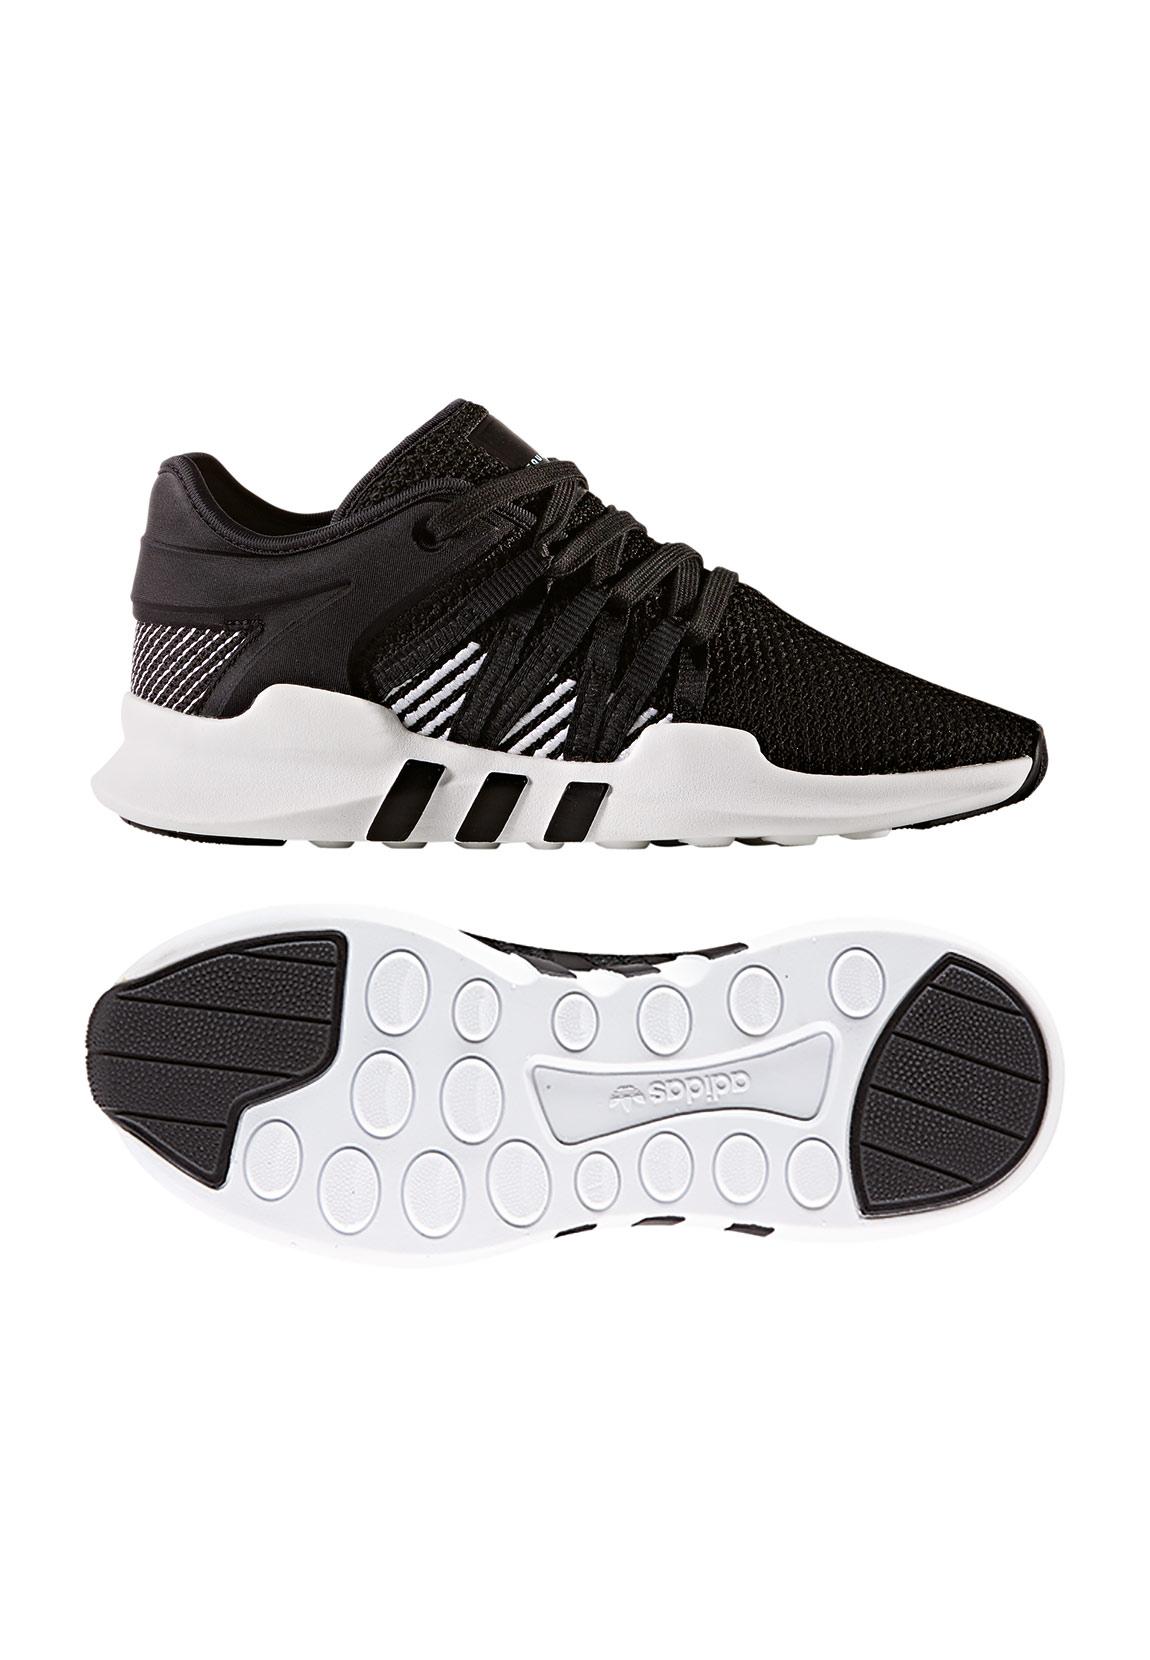 Adidas Sneaker EQT RACING ADV W BY9795 Schwarz Weiß Schuhe Herren 7415fb20a9